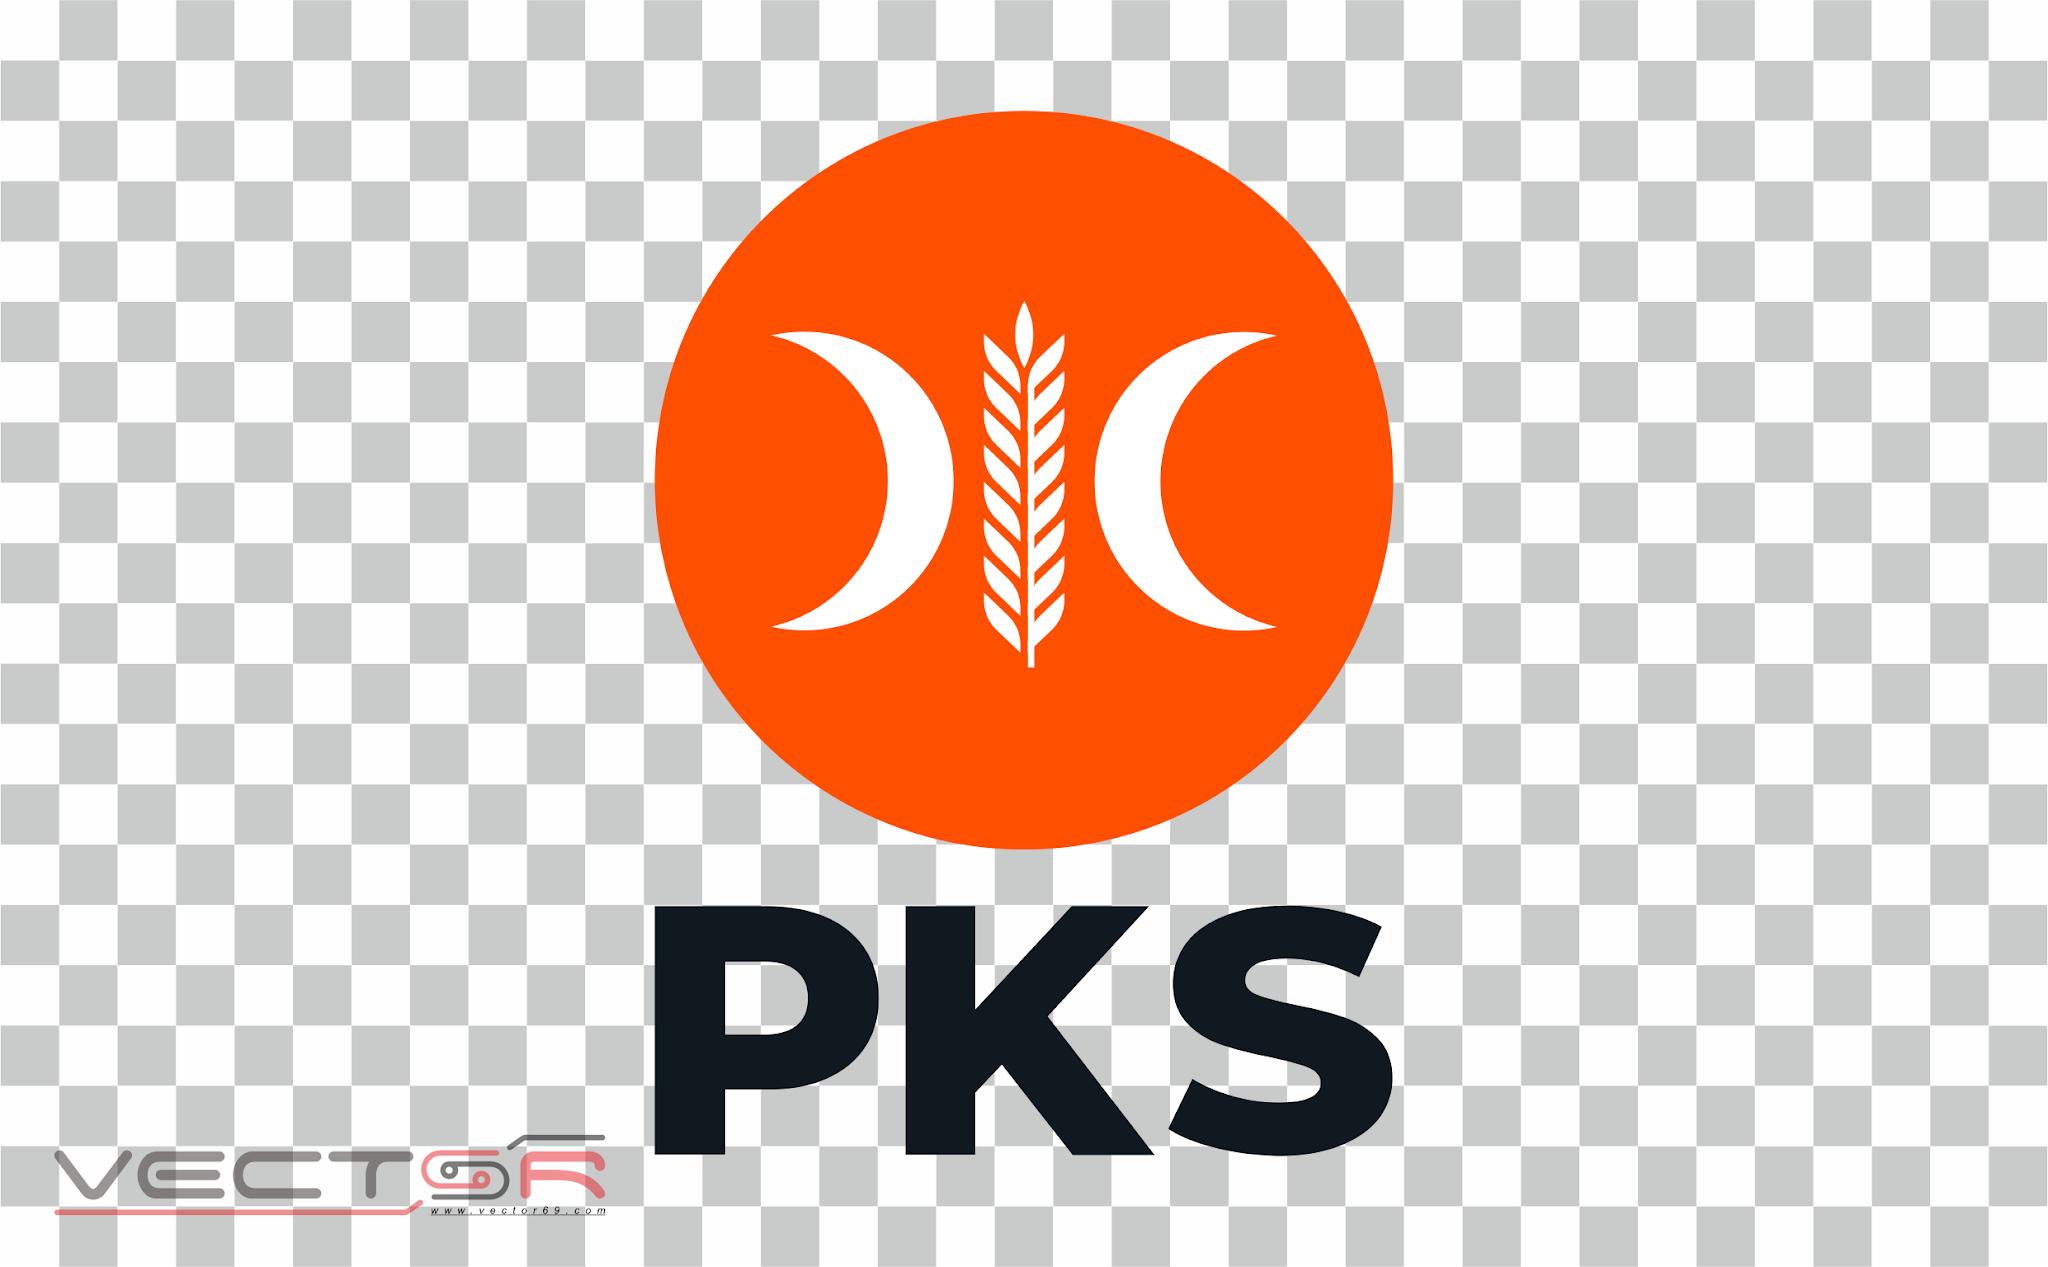 PKS (Partai Keadilan Sejahtera) New 2020 Logo - Download Vector File PNG (Portable Network Graphics)